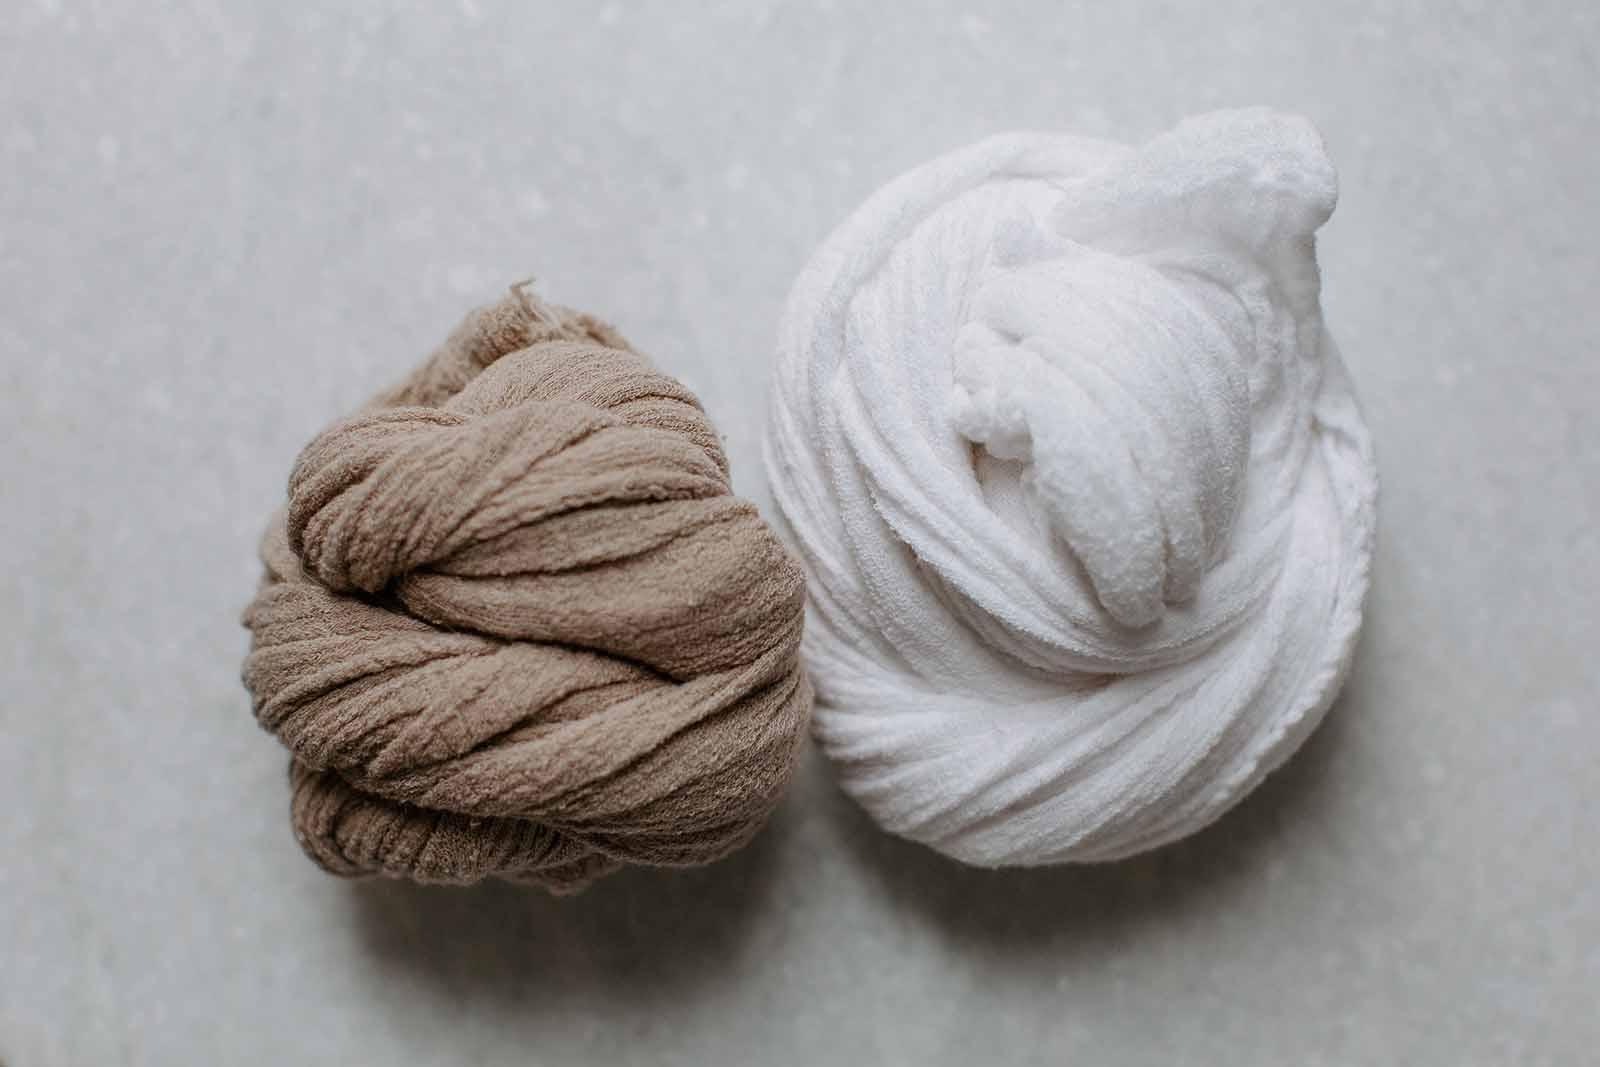 Newborn photography studio essentials: swaddle blankets